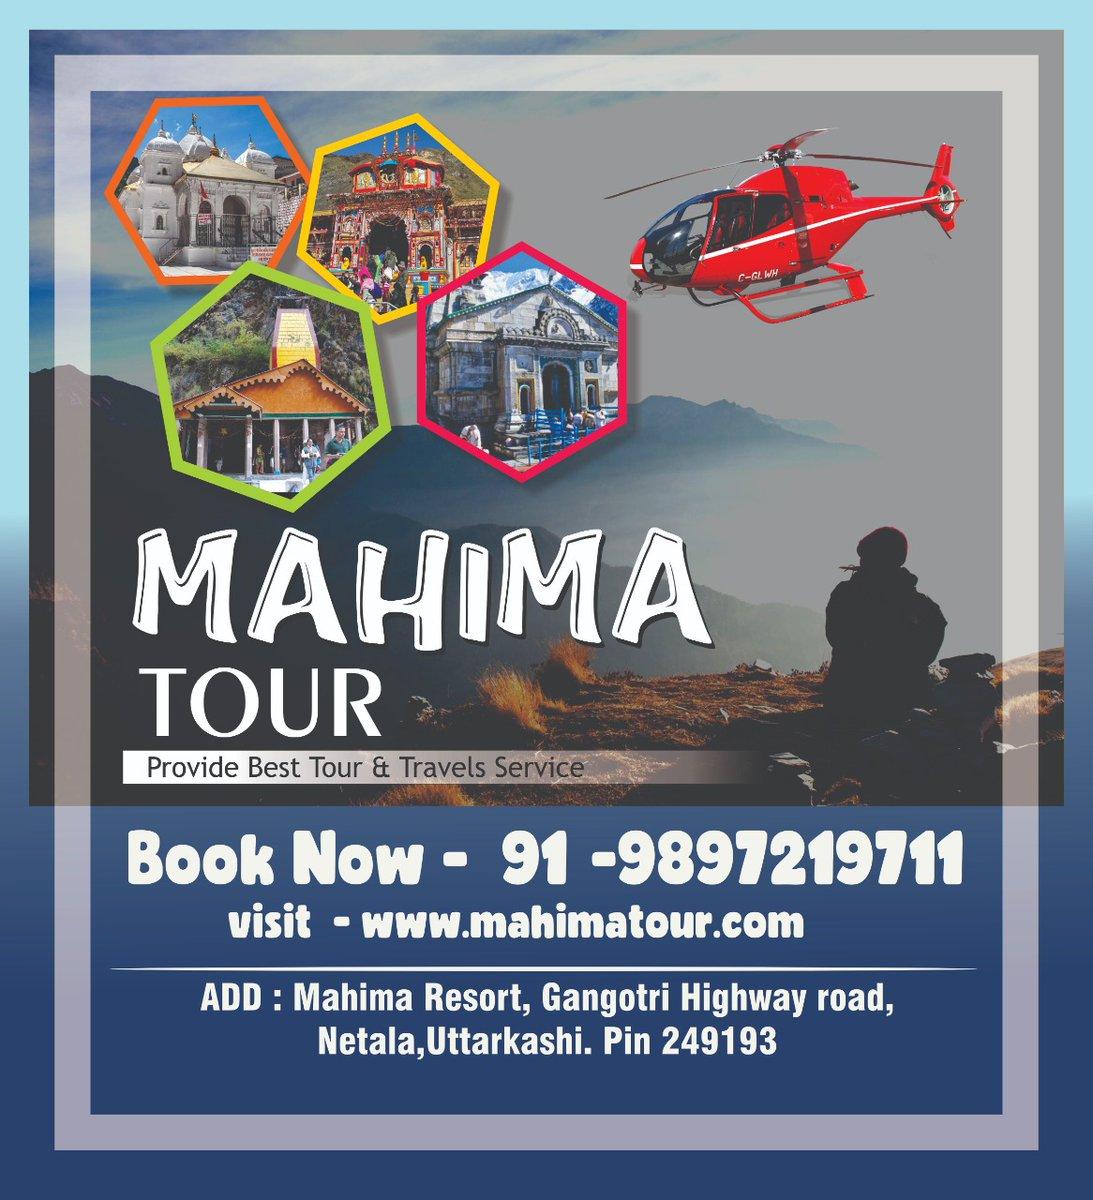 #TourismMonth2020  #Tours  #TourismMonth  #uttarakhandtourism  #Traveller  #travellife  #HimachalPradesh  #Mahadev  #KedarnathTemple #Rishikesh #BadrinathTemple  #haridwar #delhi #yamunotri #gangotri  #himalaya  #mountainobsession https://t.co/mHduGD5qXA